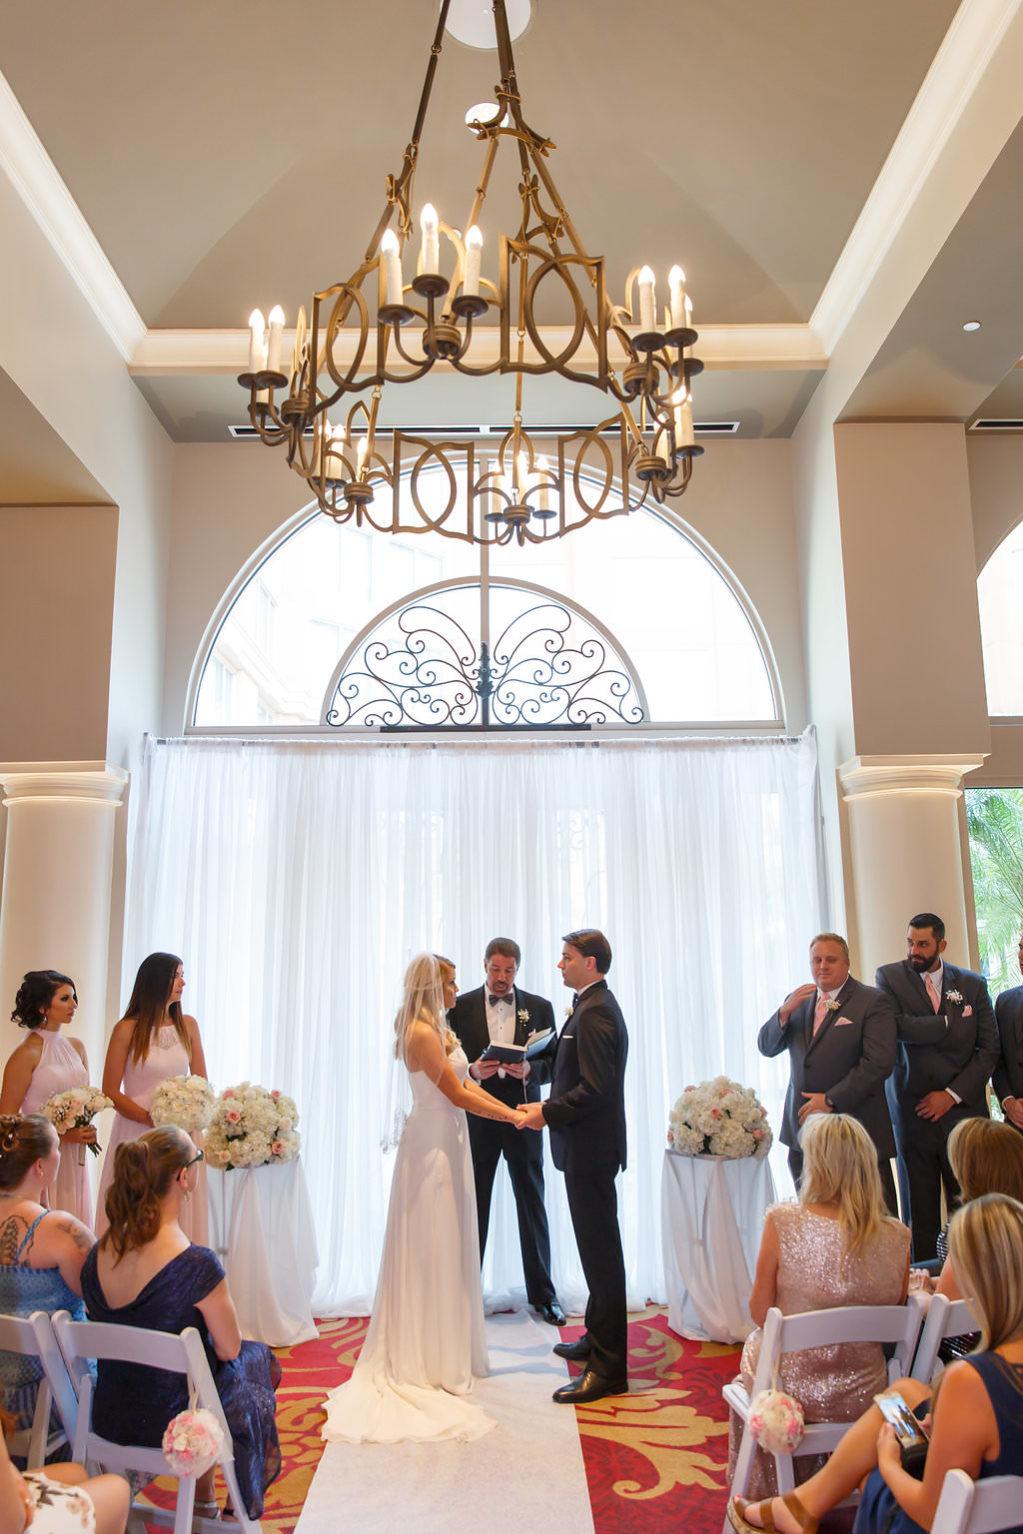 Indoor Hotel Wedding Ceremony Portrait   Hotel Wedding Venue The Tampa Renaissance